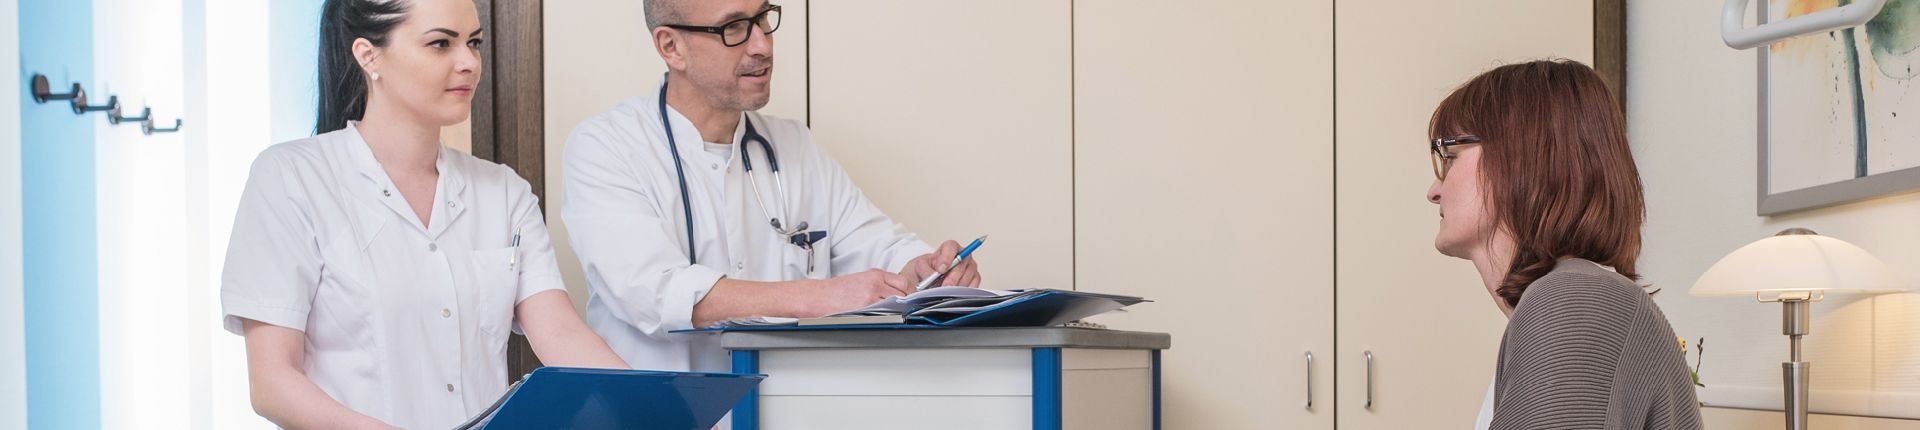 Rheumatologie: Diagnostik